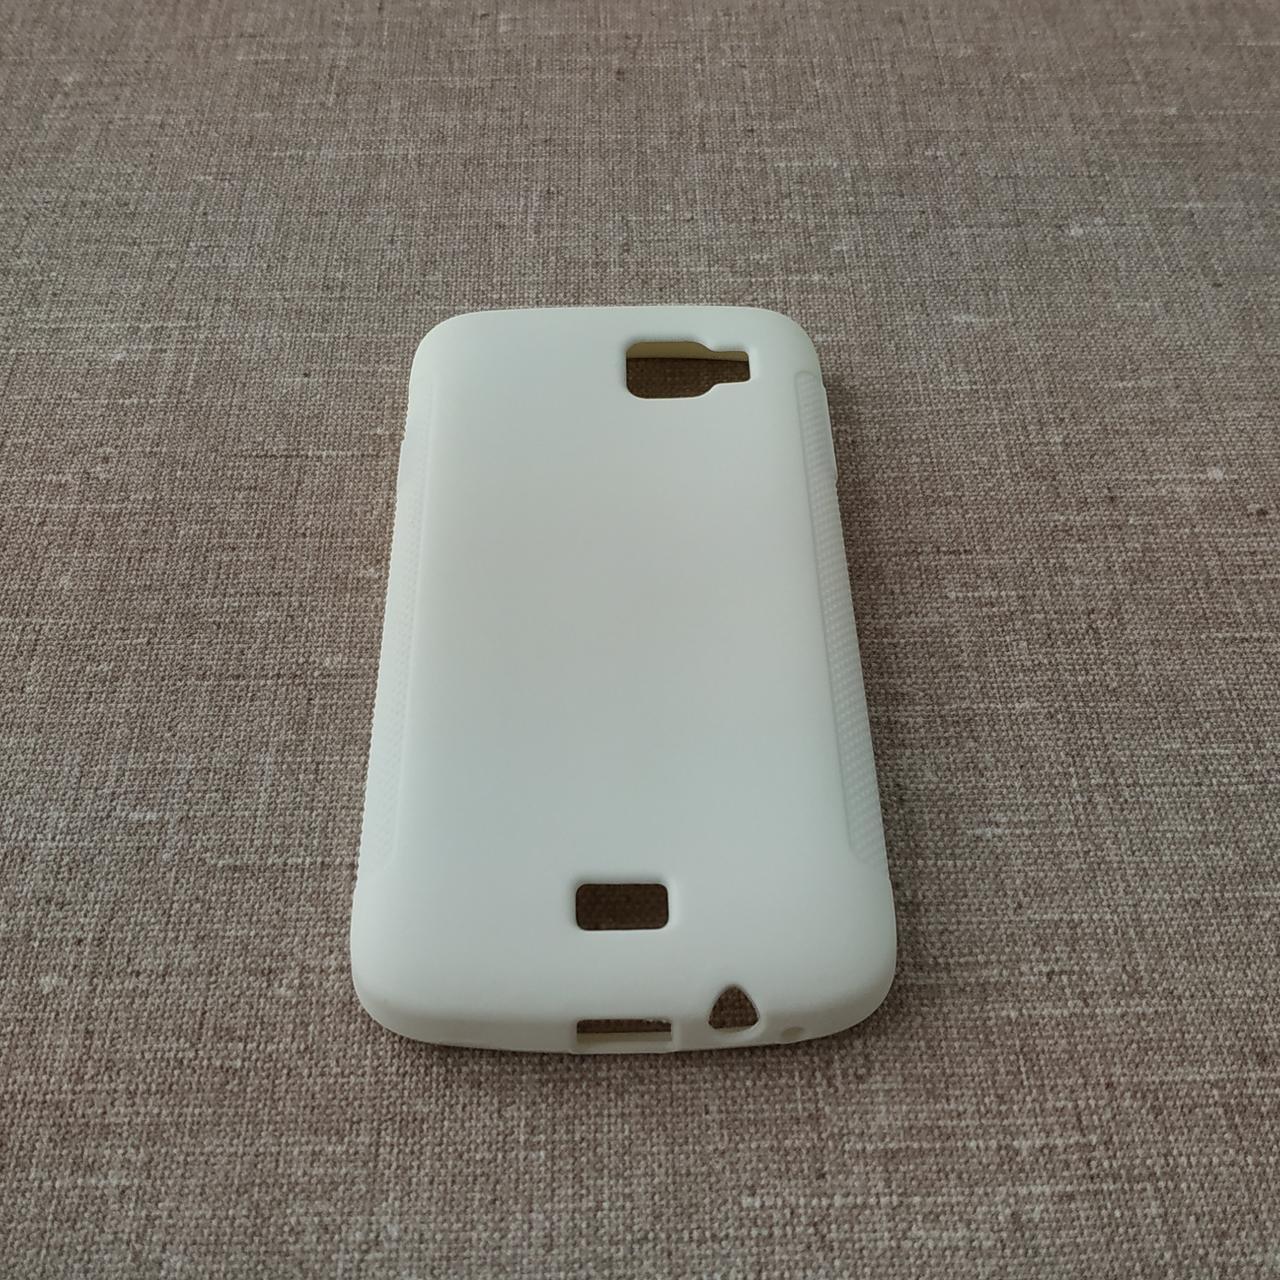 Чехлы для Fly TPU IQ4411 white Для телефона